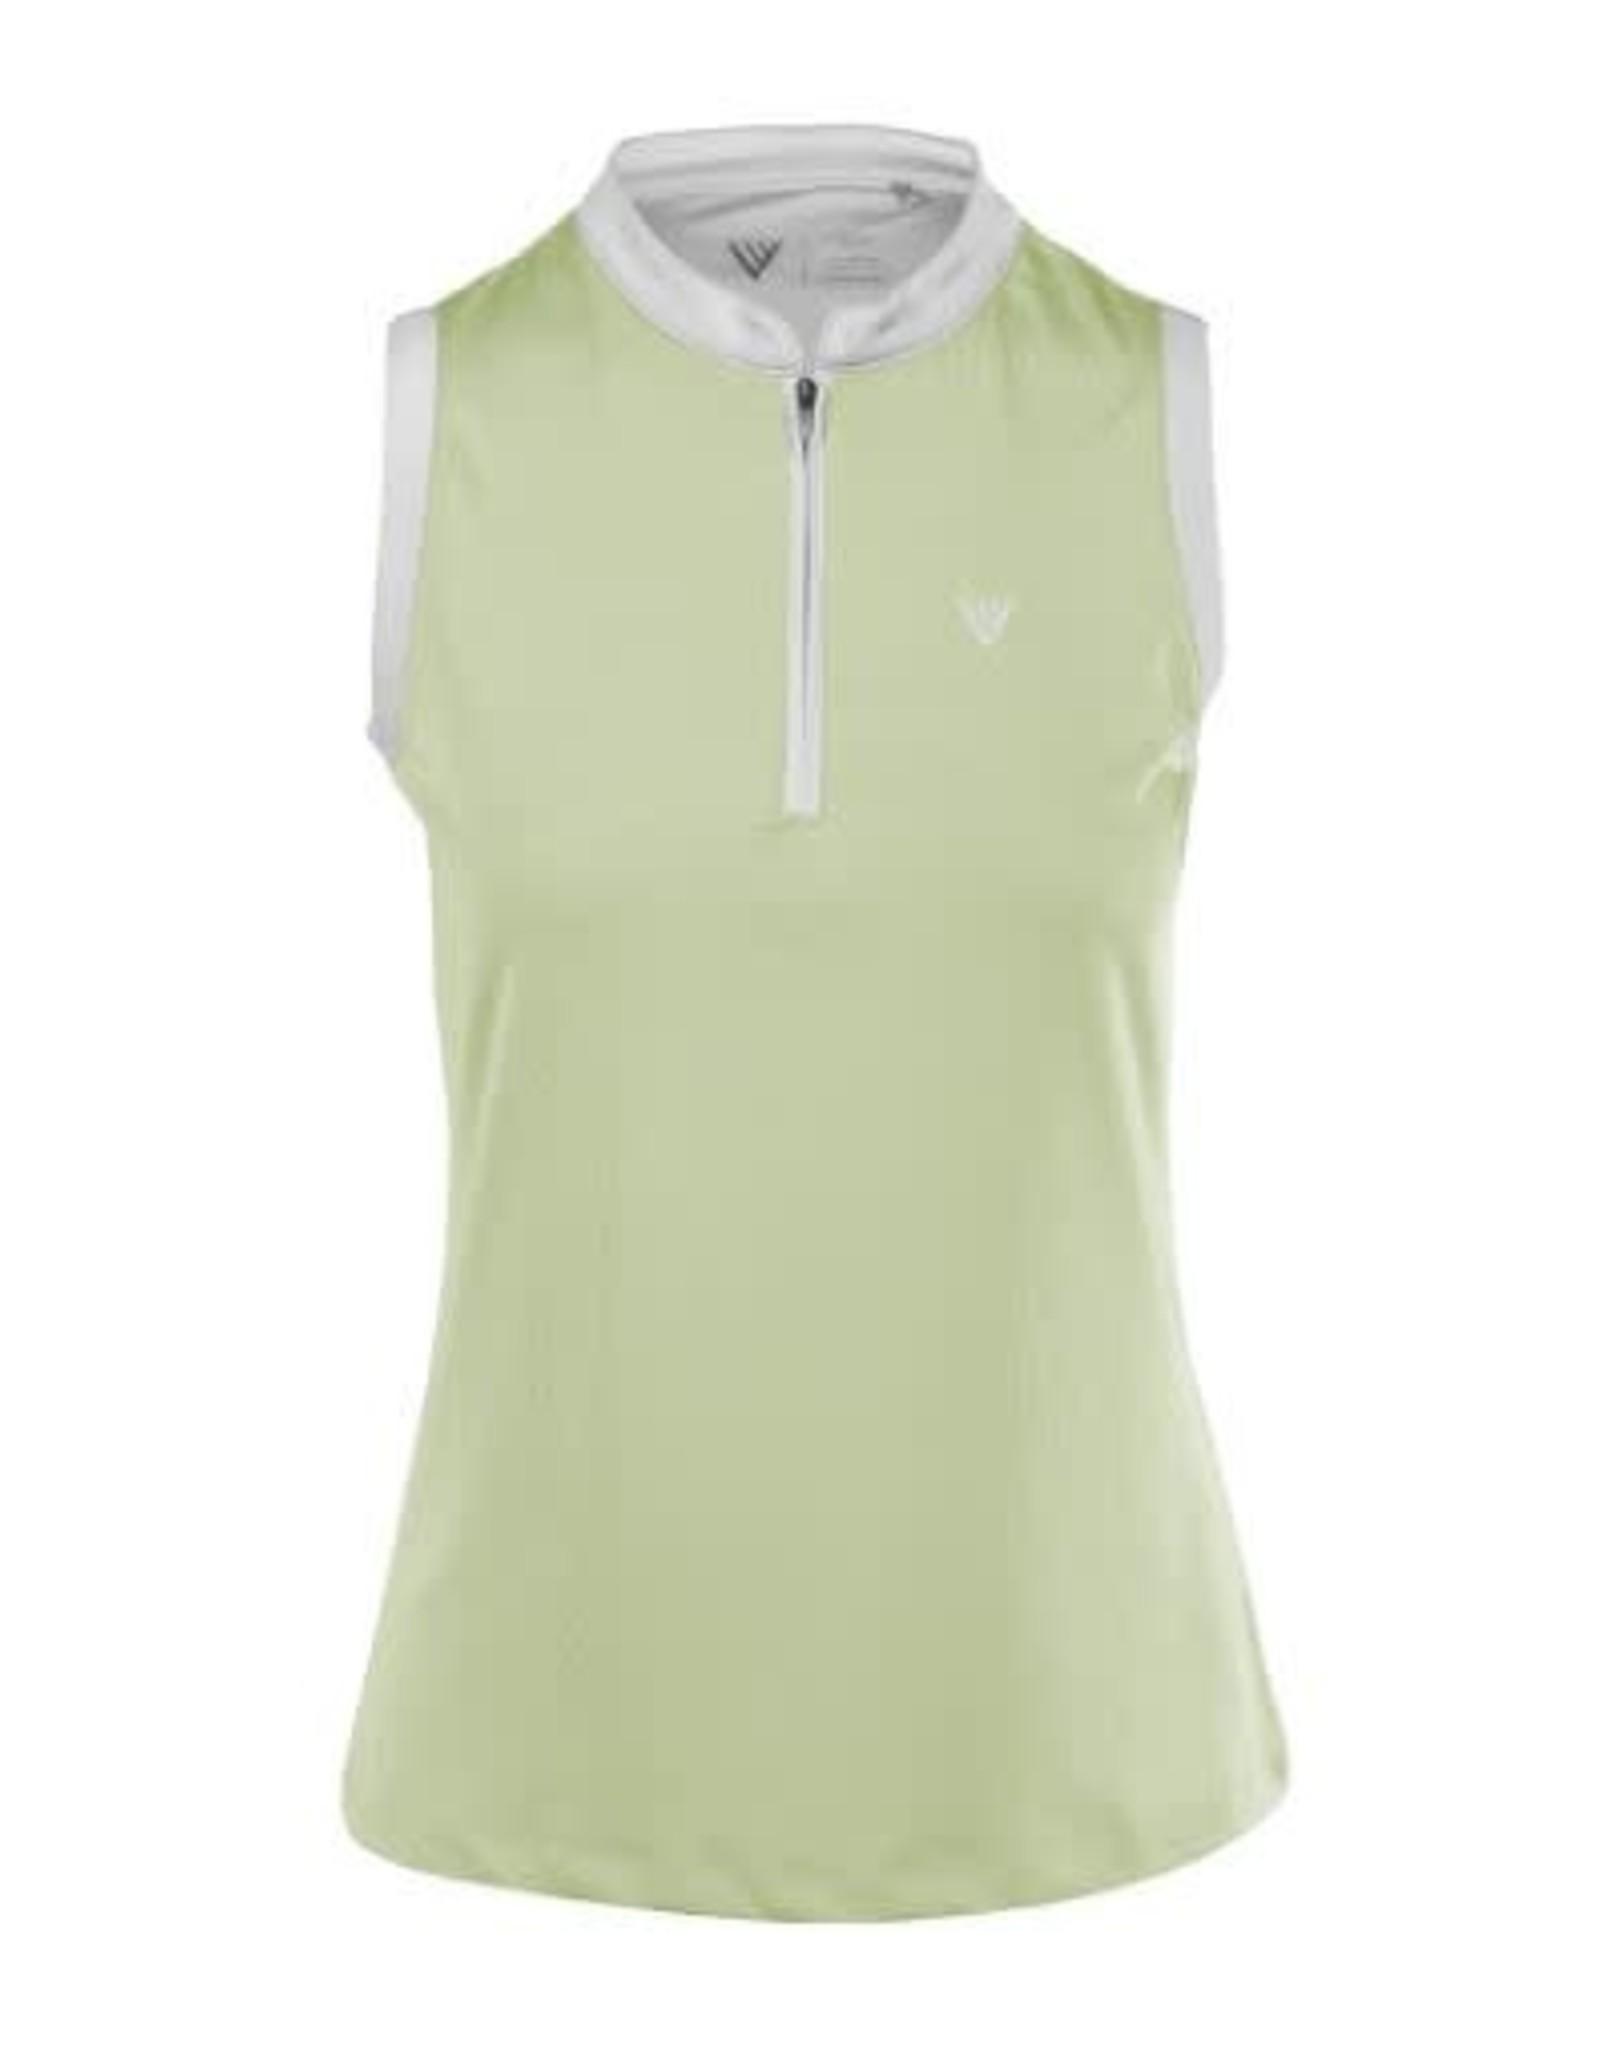 LevelWear Capri 1/4 Zip Sleeveless Shirt